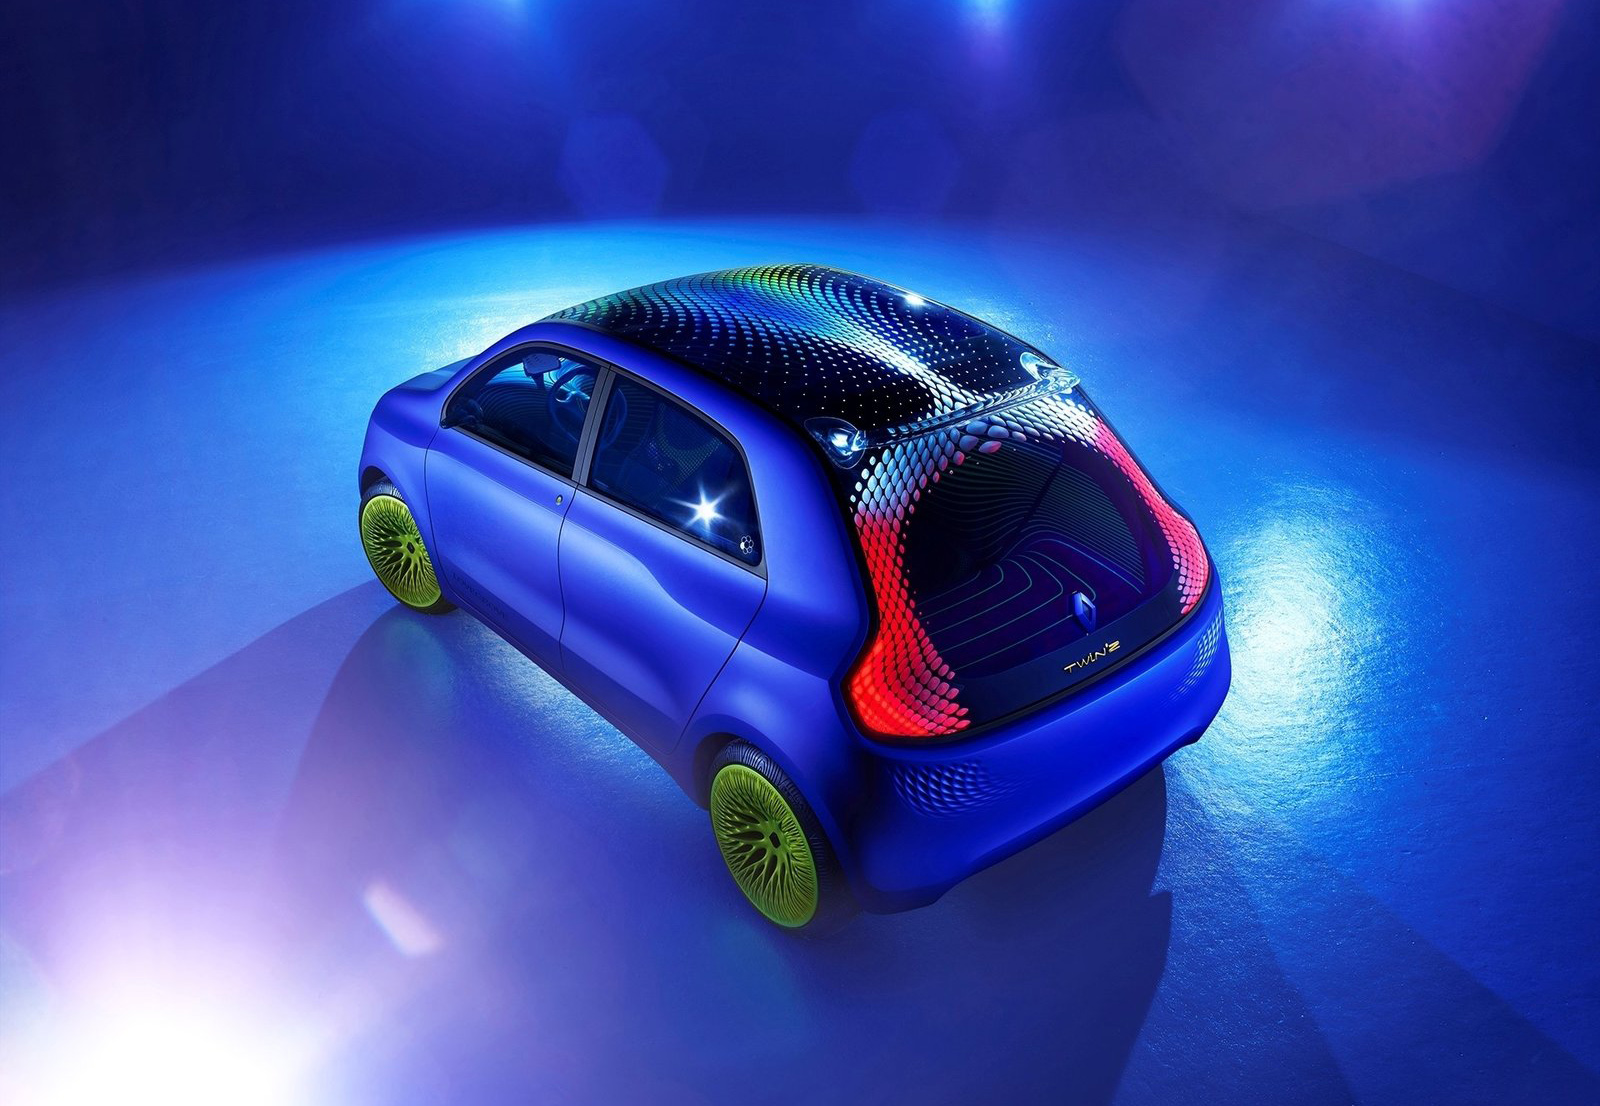 Renault-Twin-Z_Concept_2013_1600x1200_wallpaper_0b